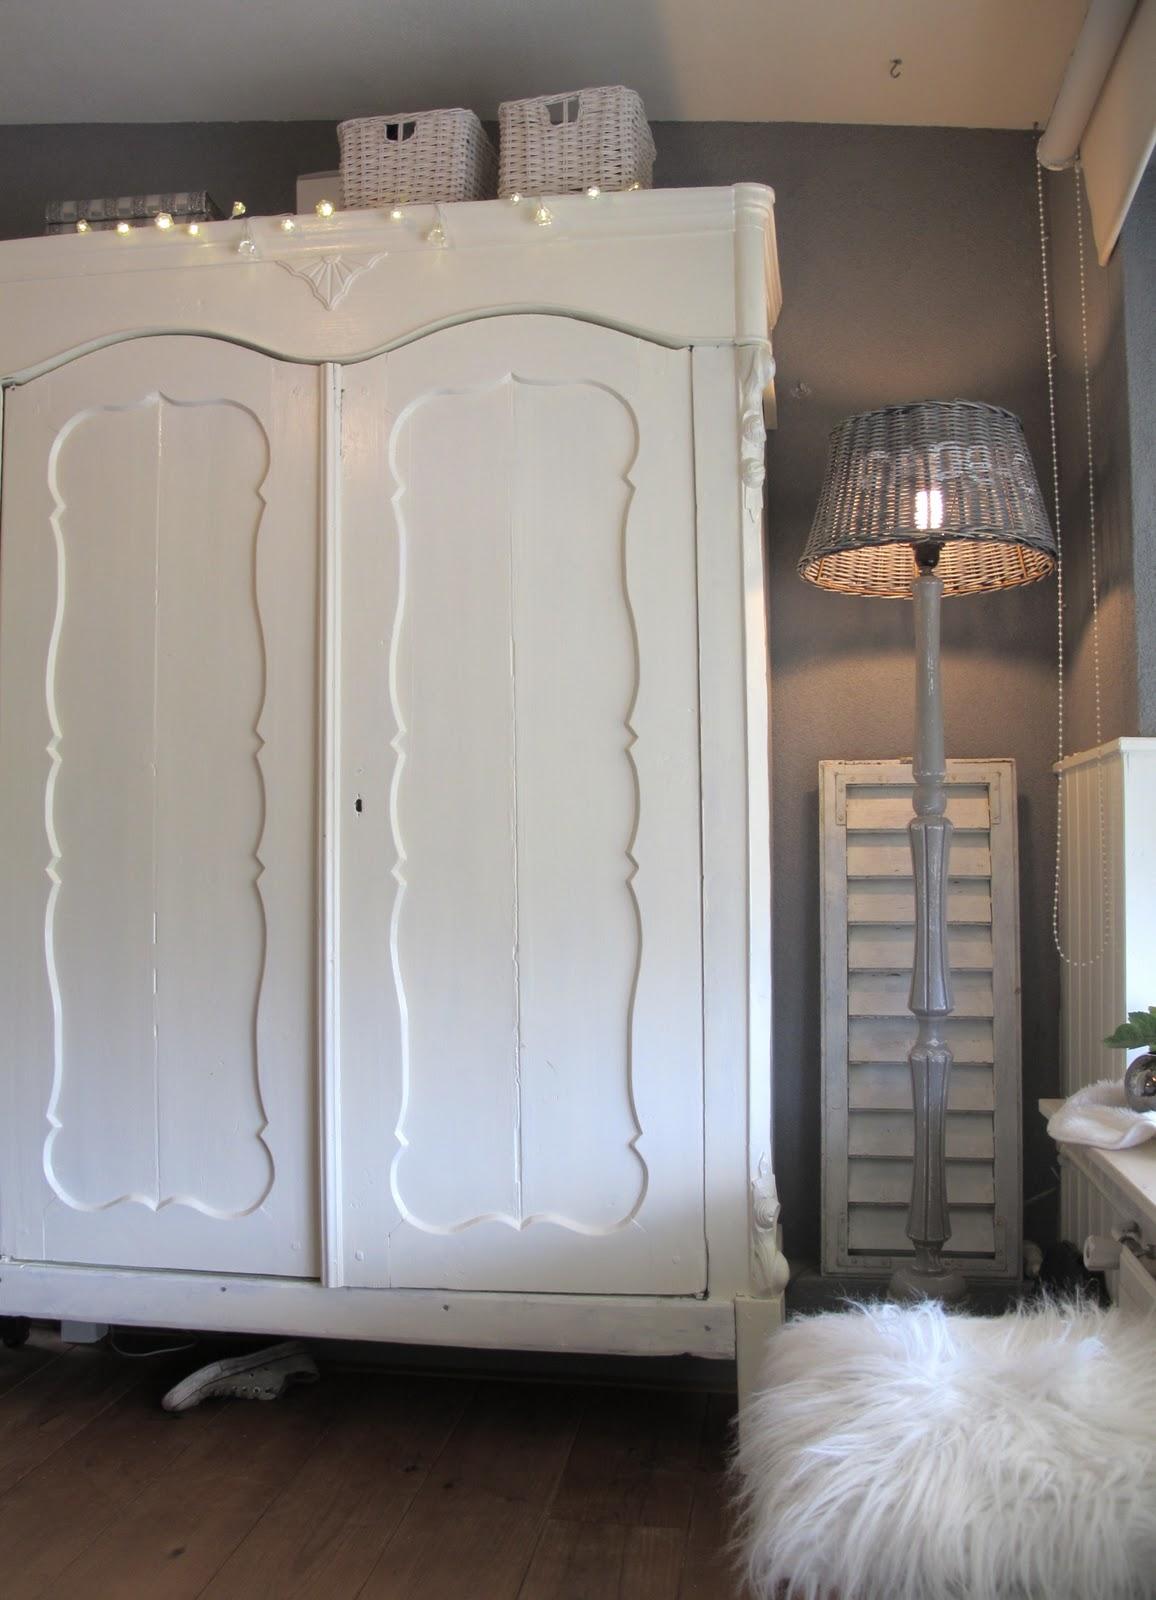 behang slaapkamer meiden : Zo richt jij jouw kleine kamer in ...